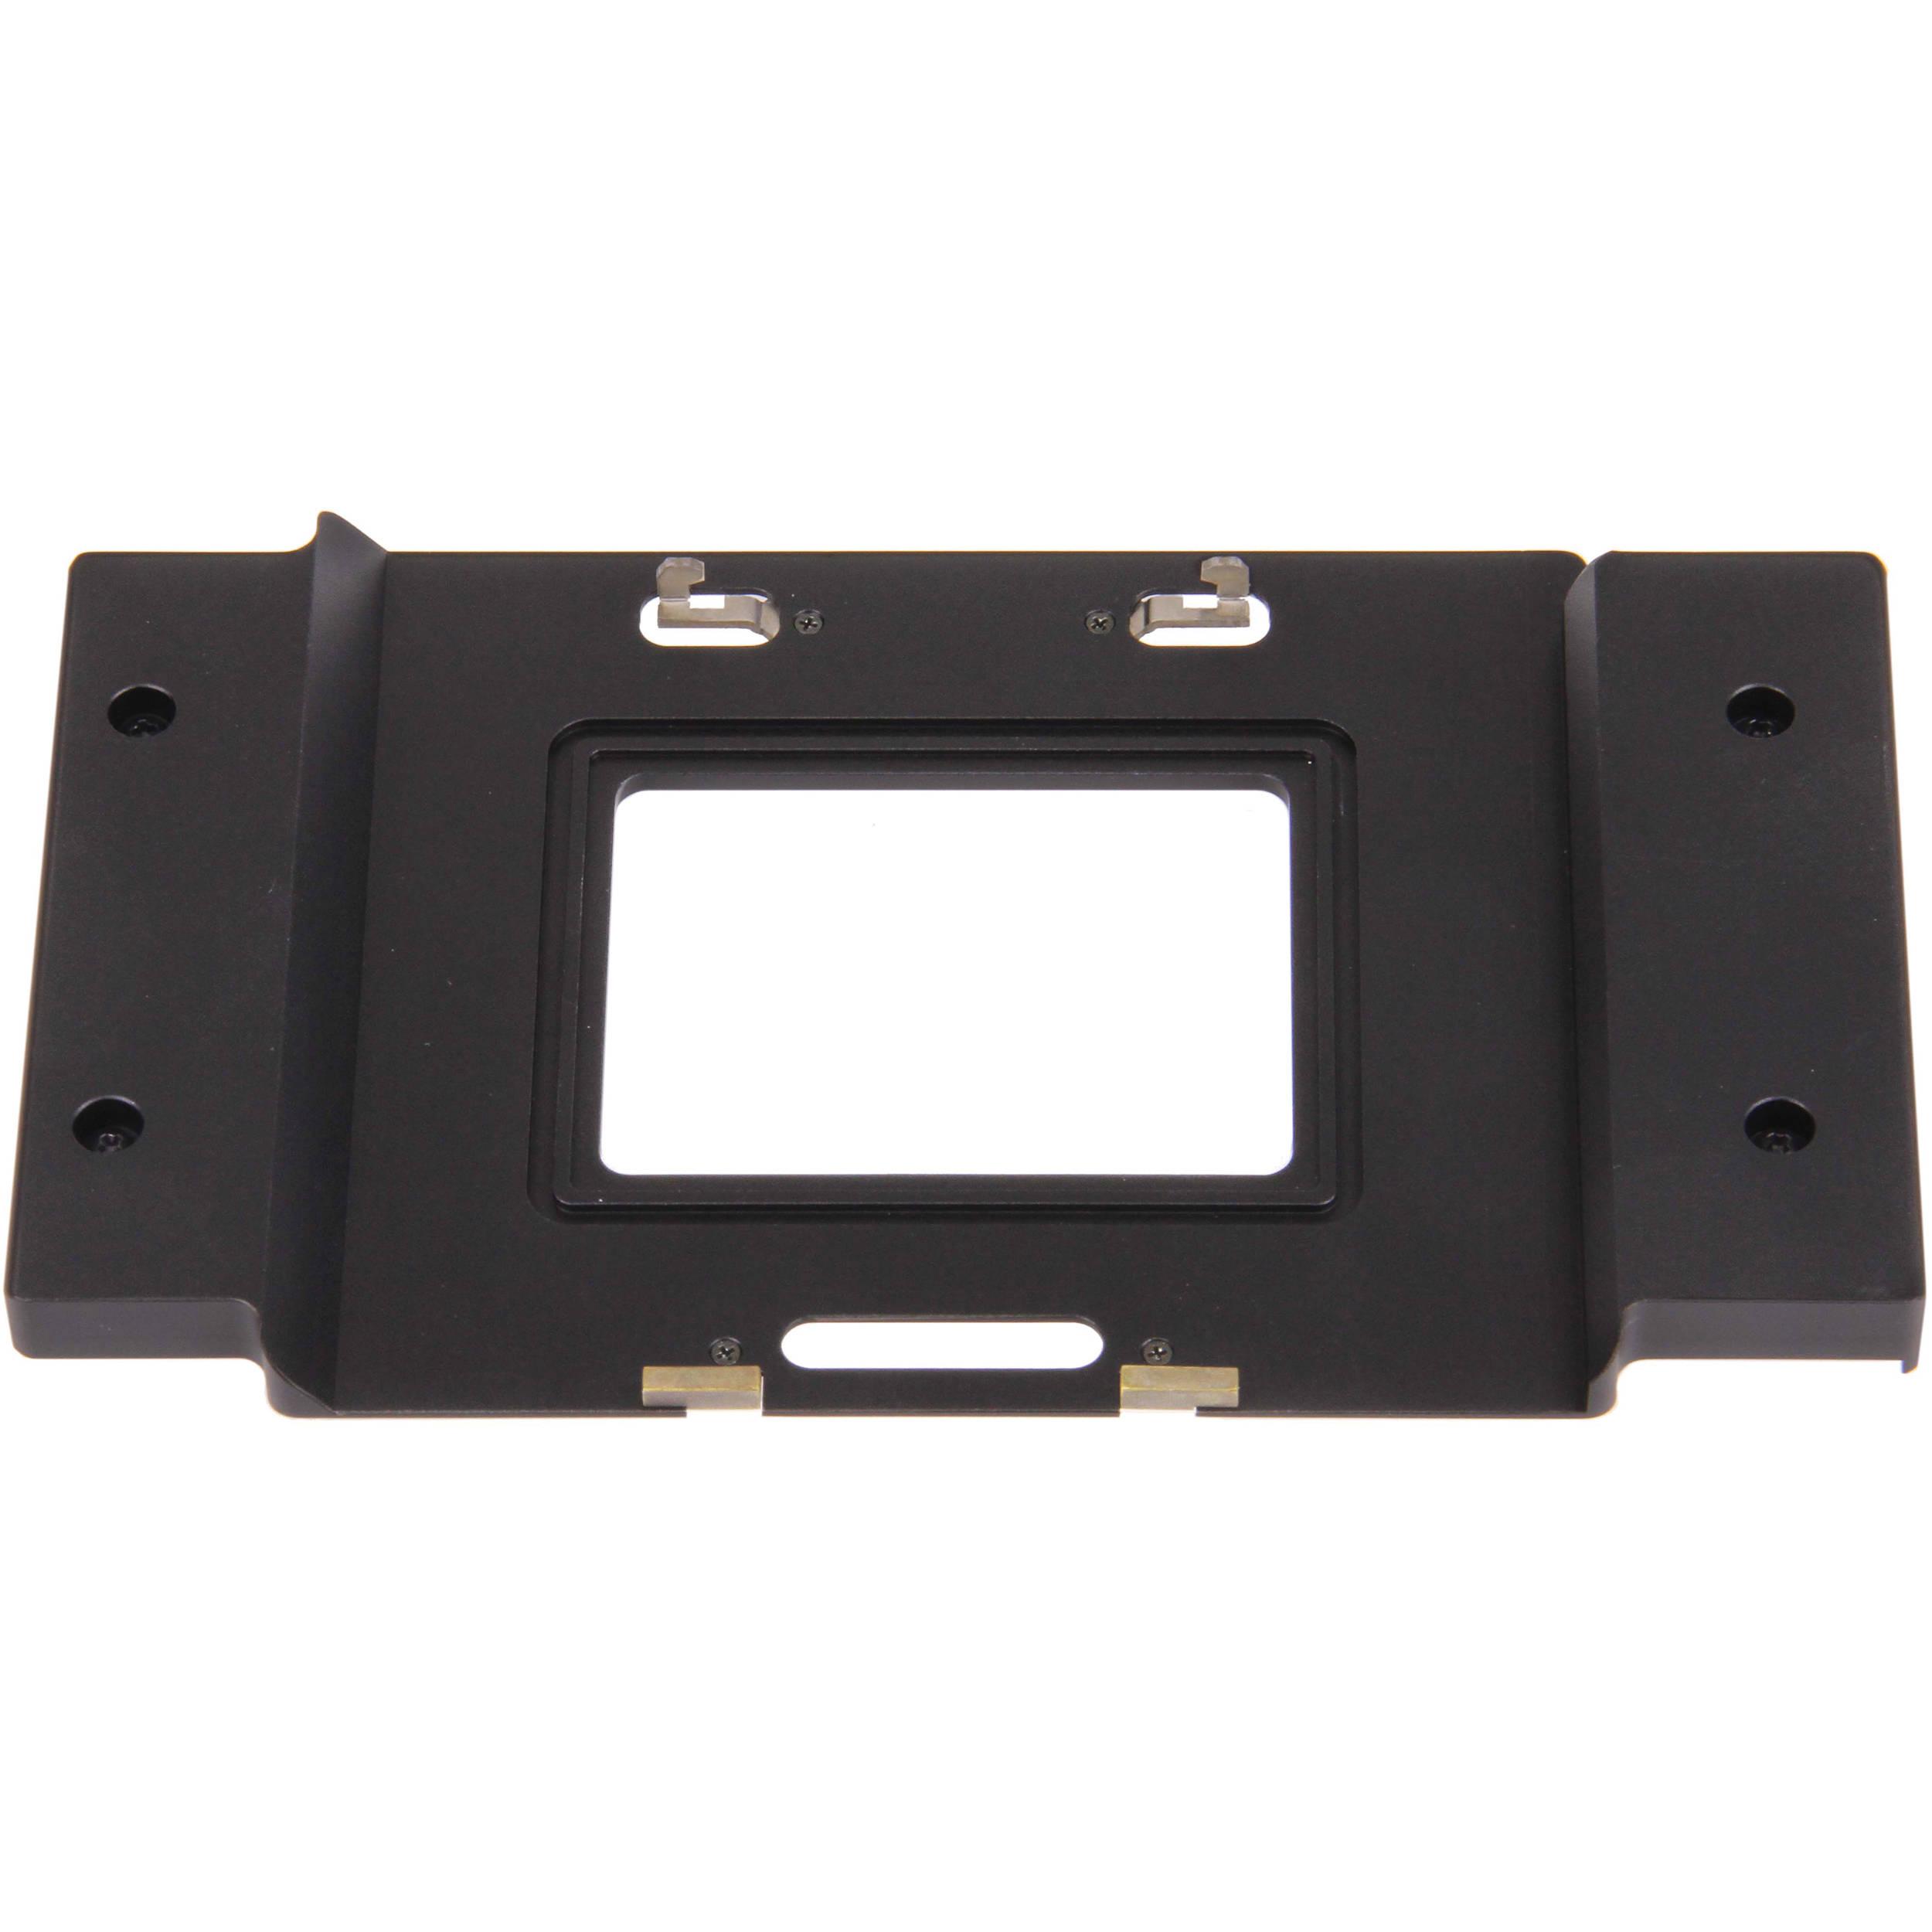 Horseman SWD Adapter Plate for Mamiya 645 Digital Backs